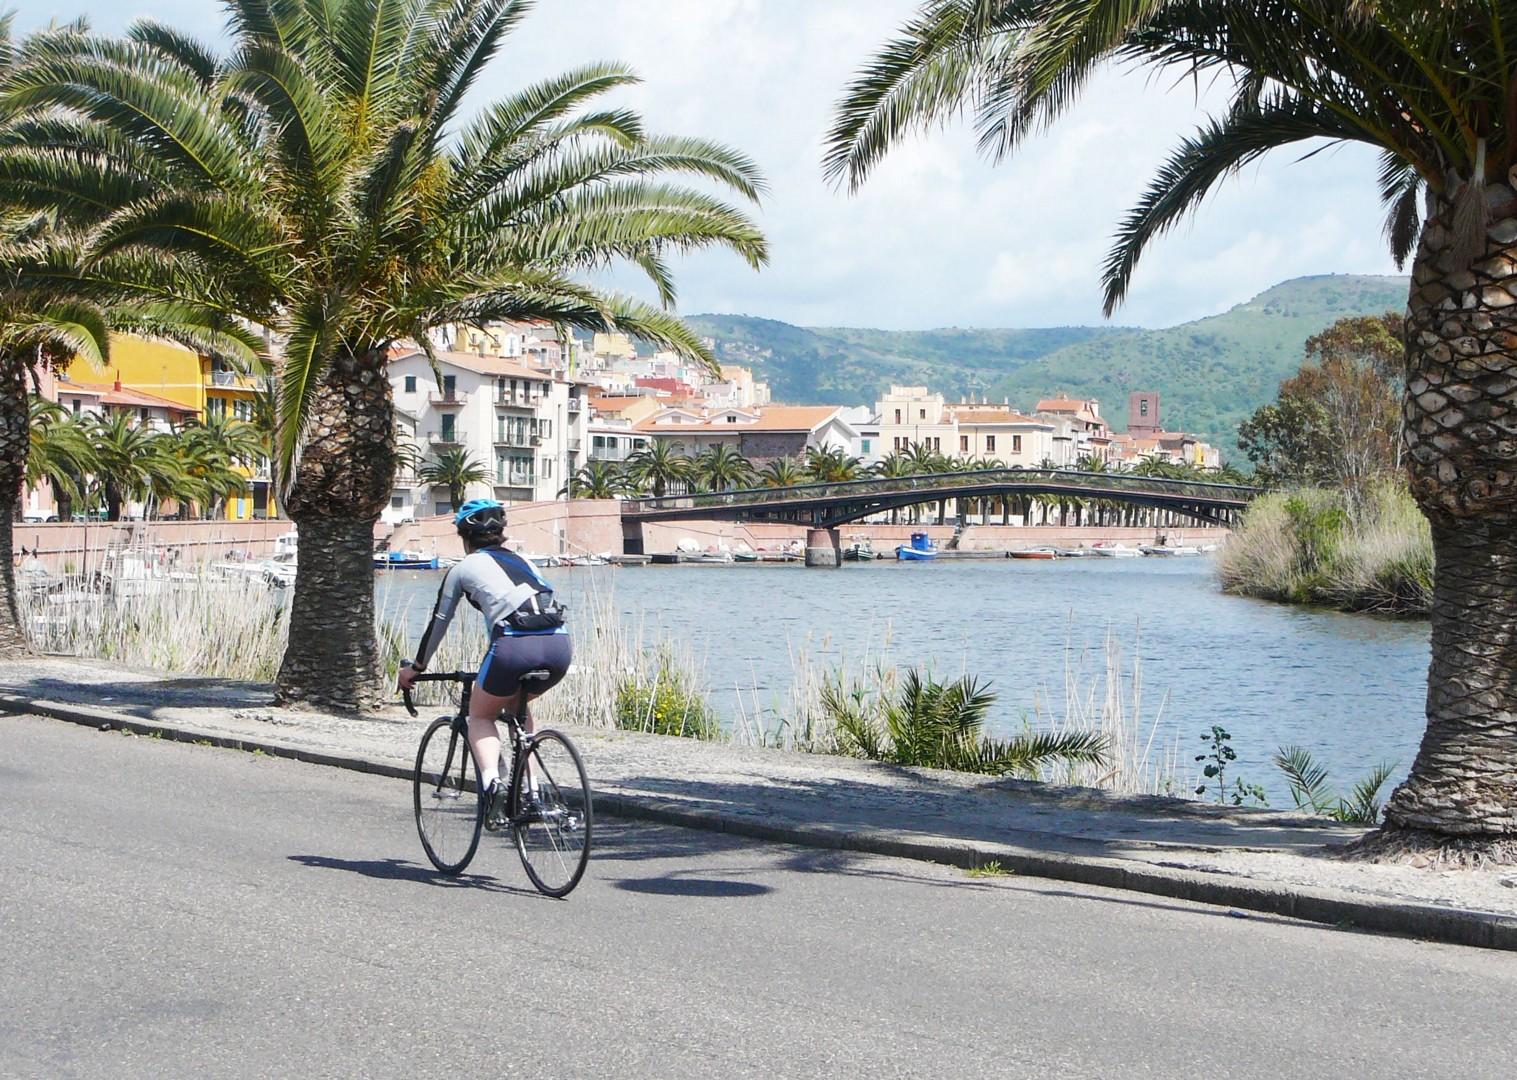 Road-Cycling-Holiday-Coastal-Explorer-Sardinia-Italy-Pan-di-Zucchero.JPG - Italy - Sardinia - Coastal Explorer - Self Guided Road Cycling Holiday - Italia Road Cycling